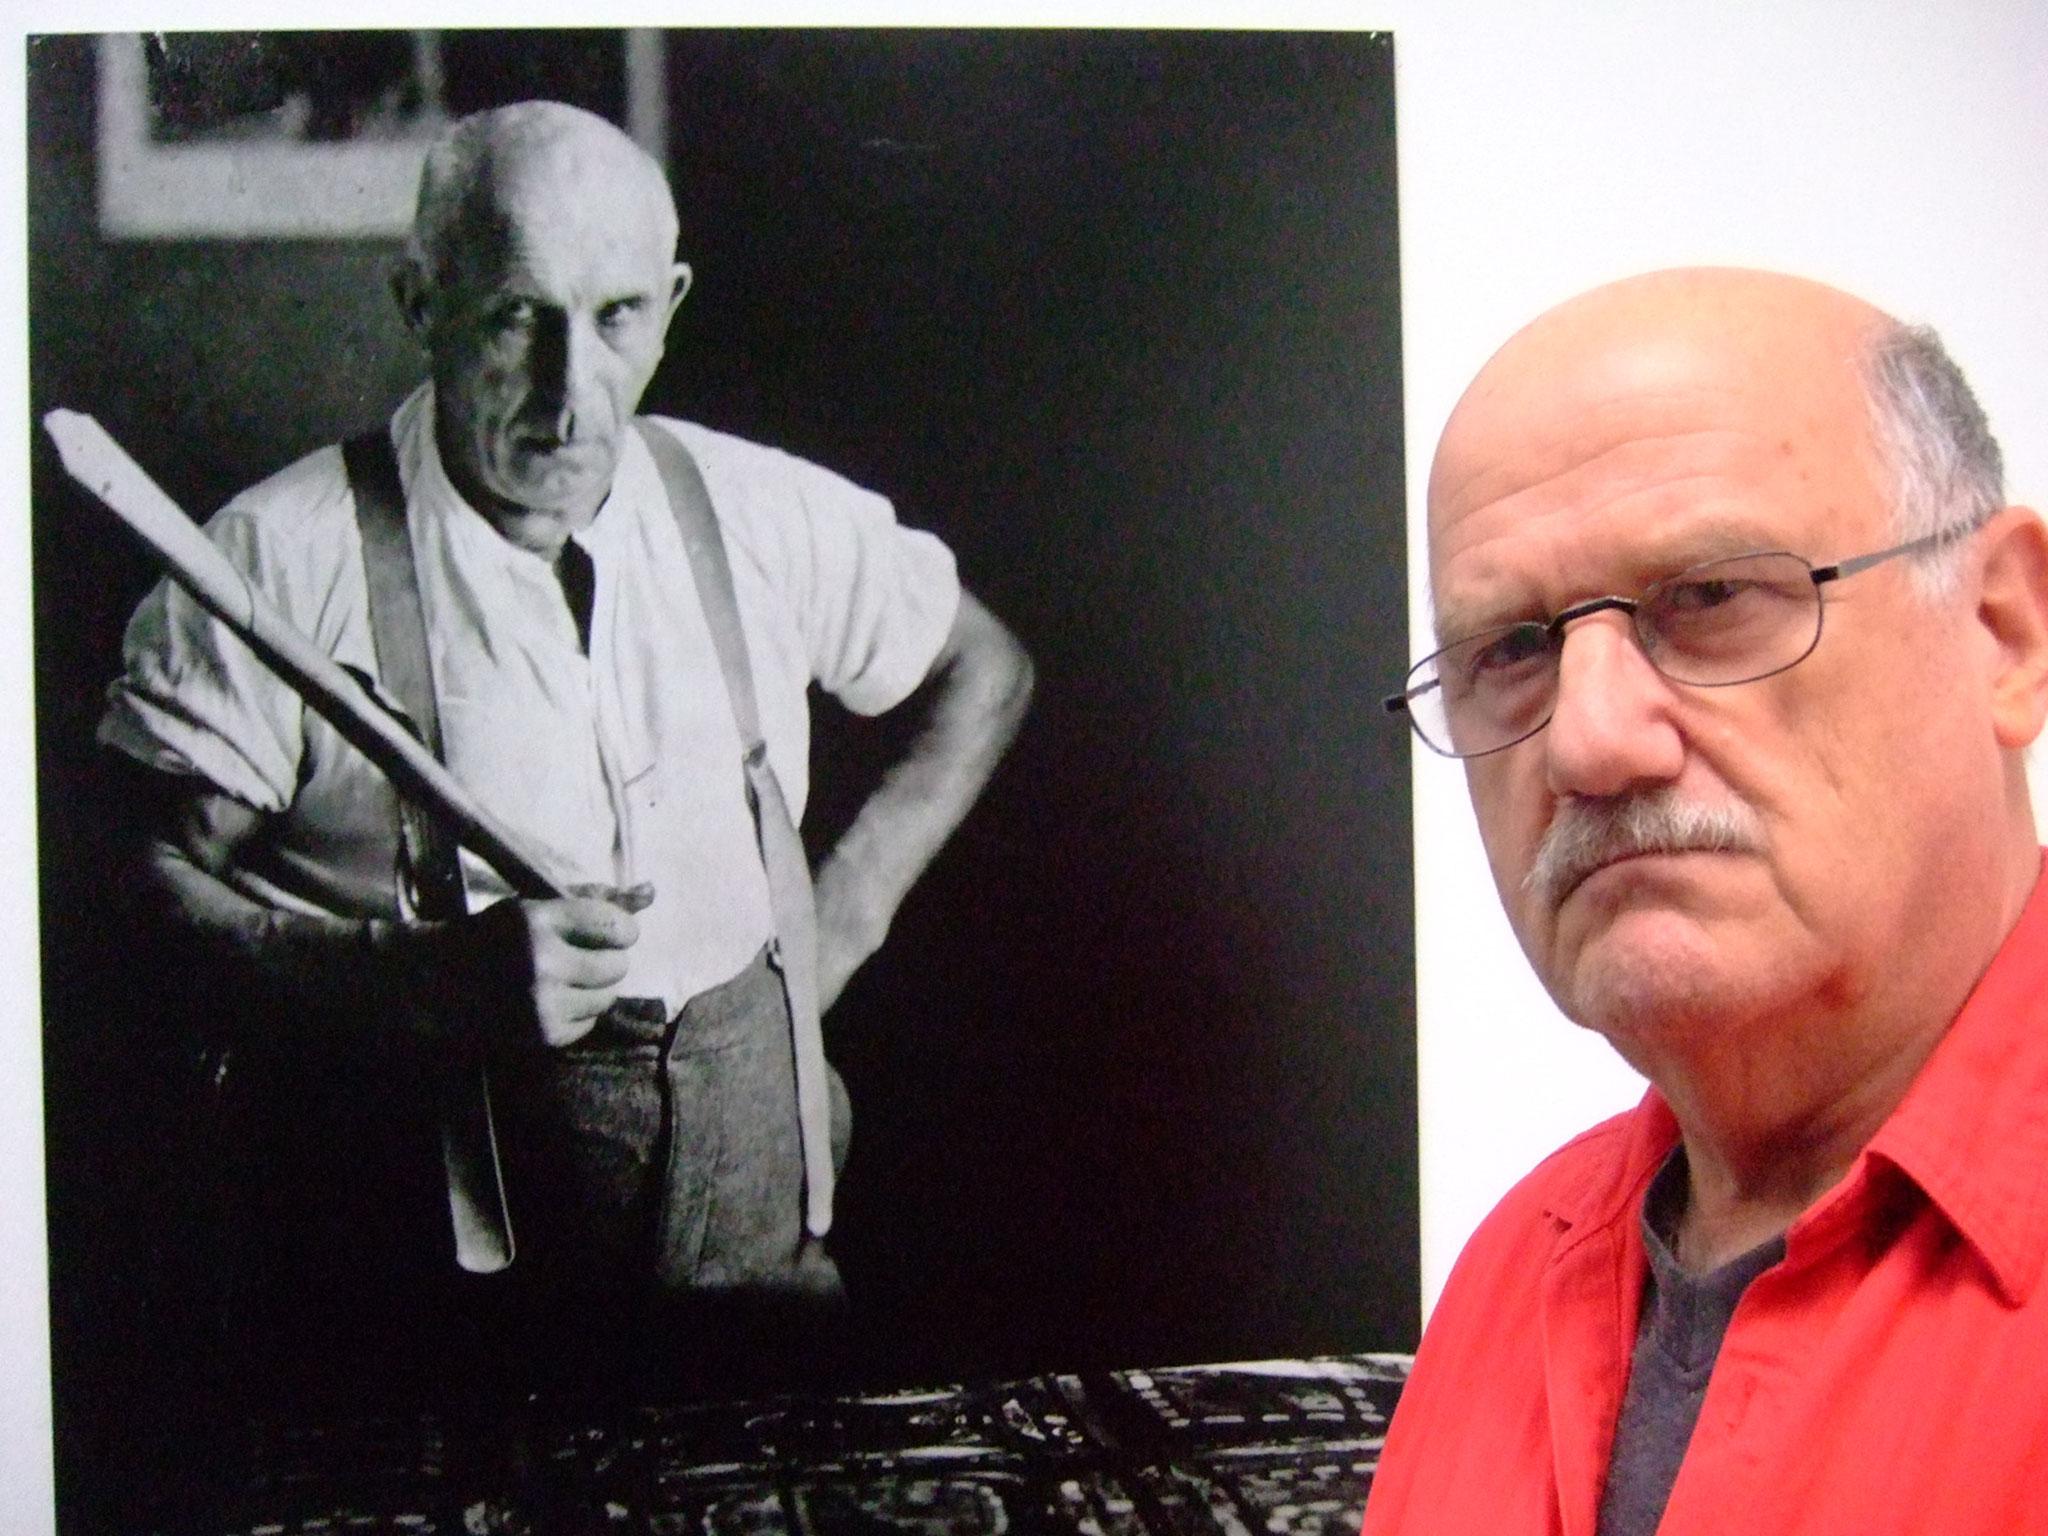 Pedro Meier PhotoArt –»Adolf Wölfli trifft auf Pedro Meier« Kunstmuseum Bern Switzerland – »Selfie-Art-Project« – Photo 2014 © Pedro Meier Multimedia Artist / ProLitteris – Niederbipp – Bangkok